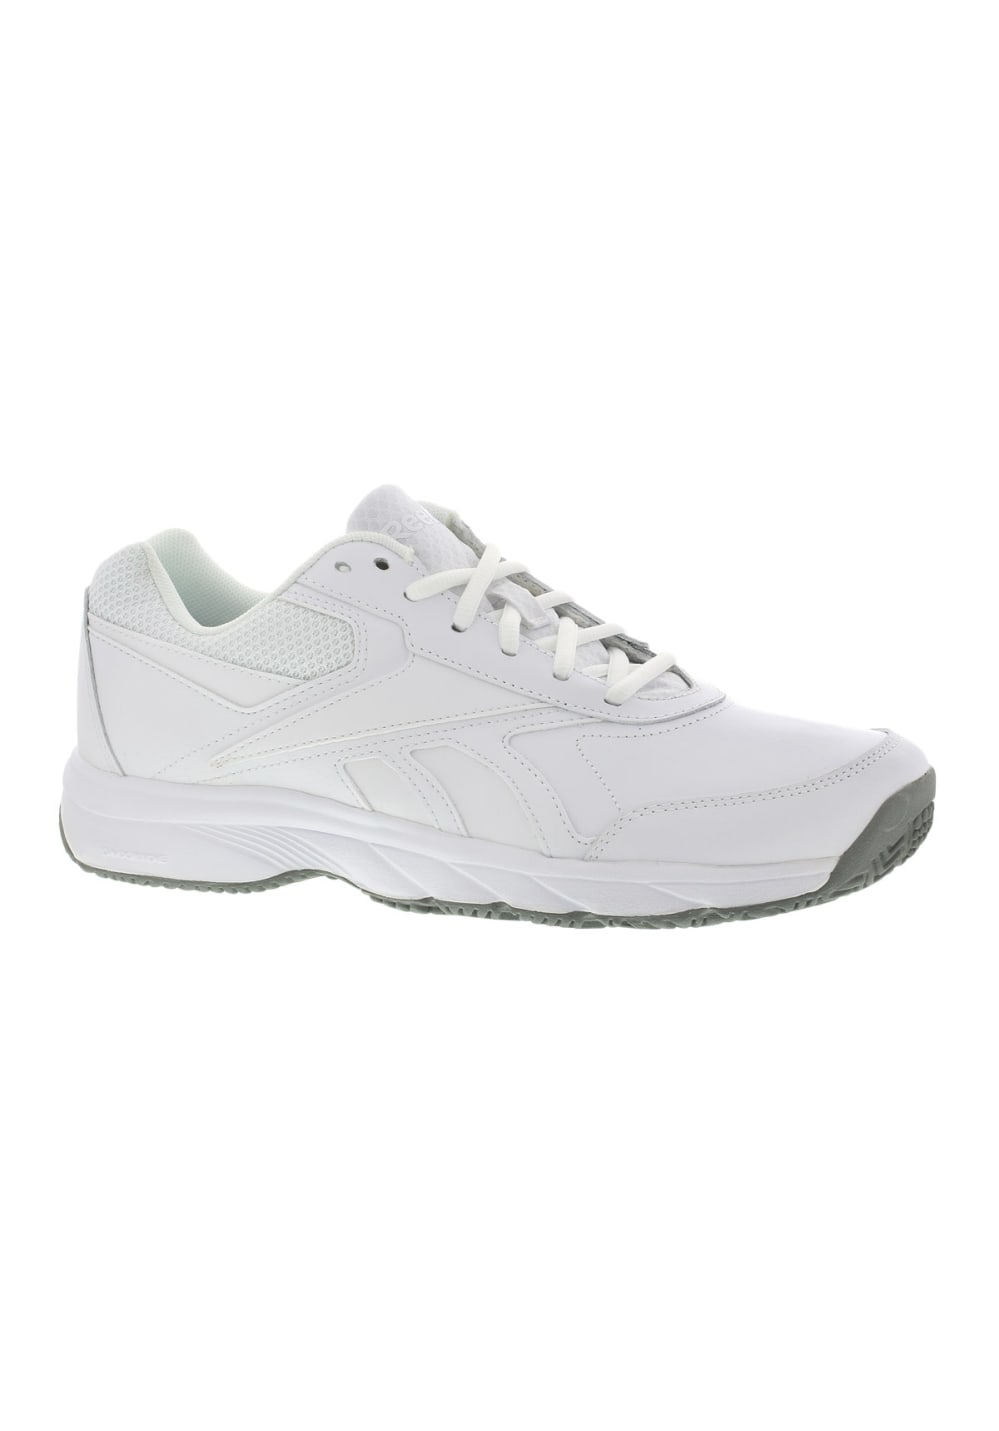 Reebok Work N Cushion 2 0 Walking Shoes For Women White